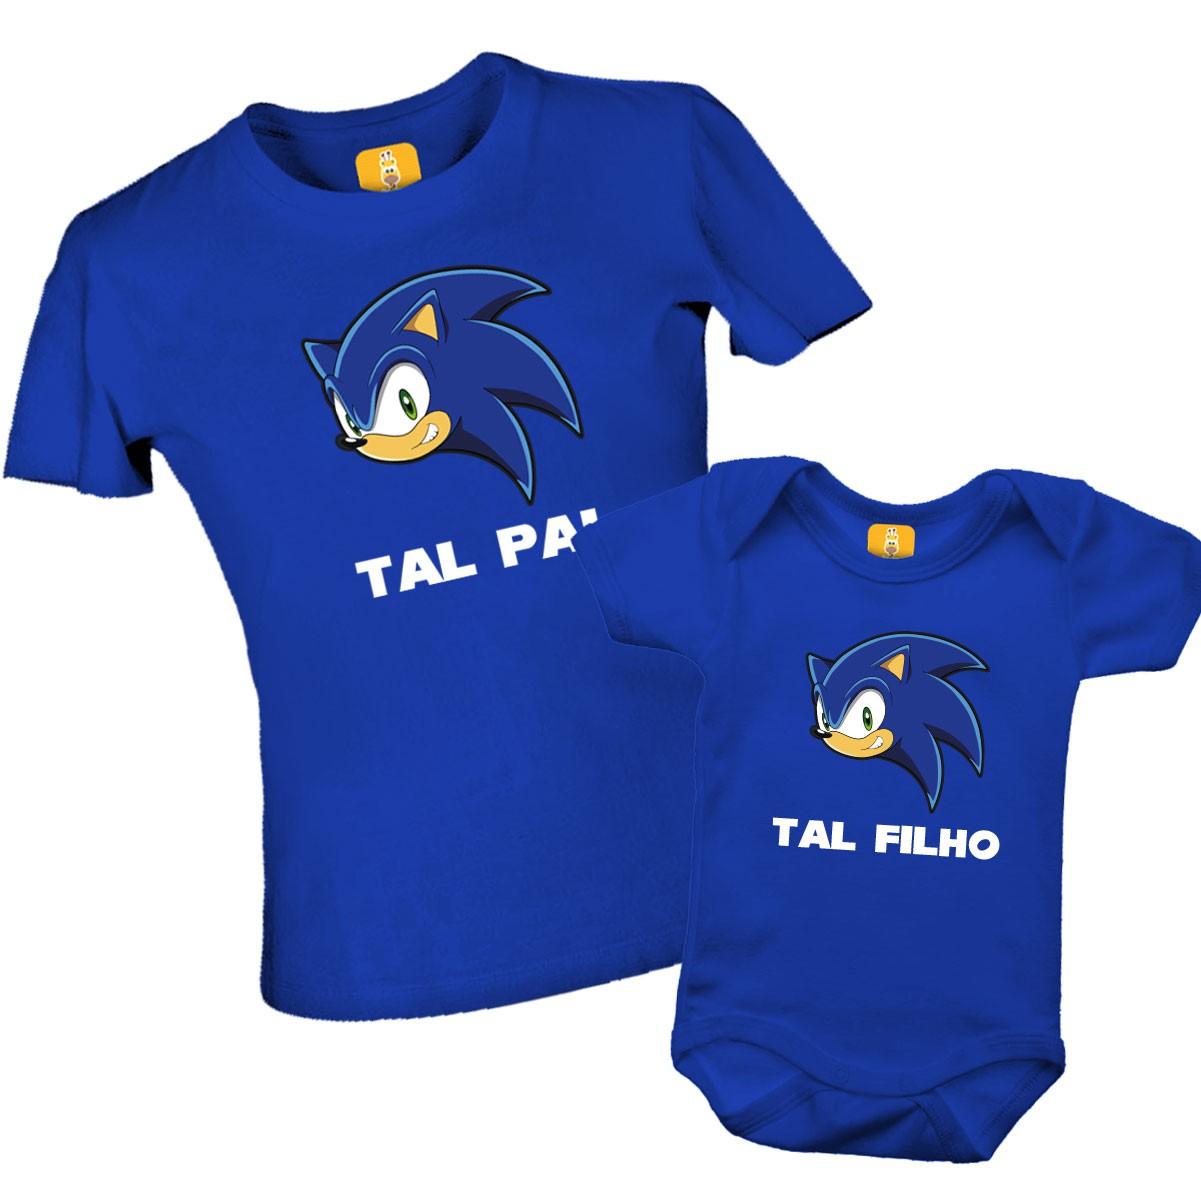 Camiseta Sonic Tal pai Tal filho